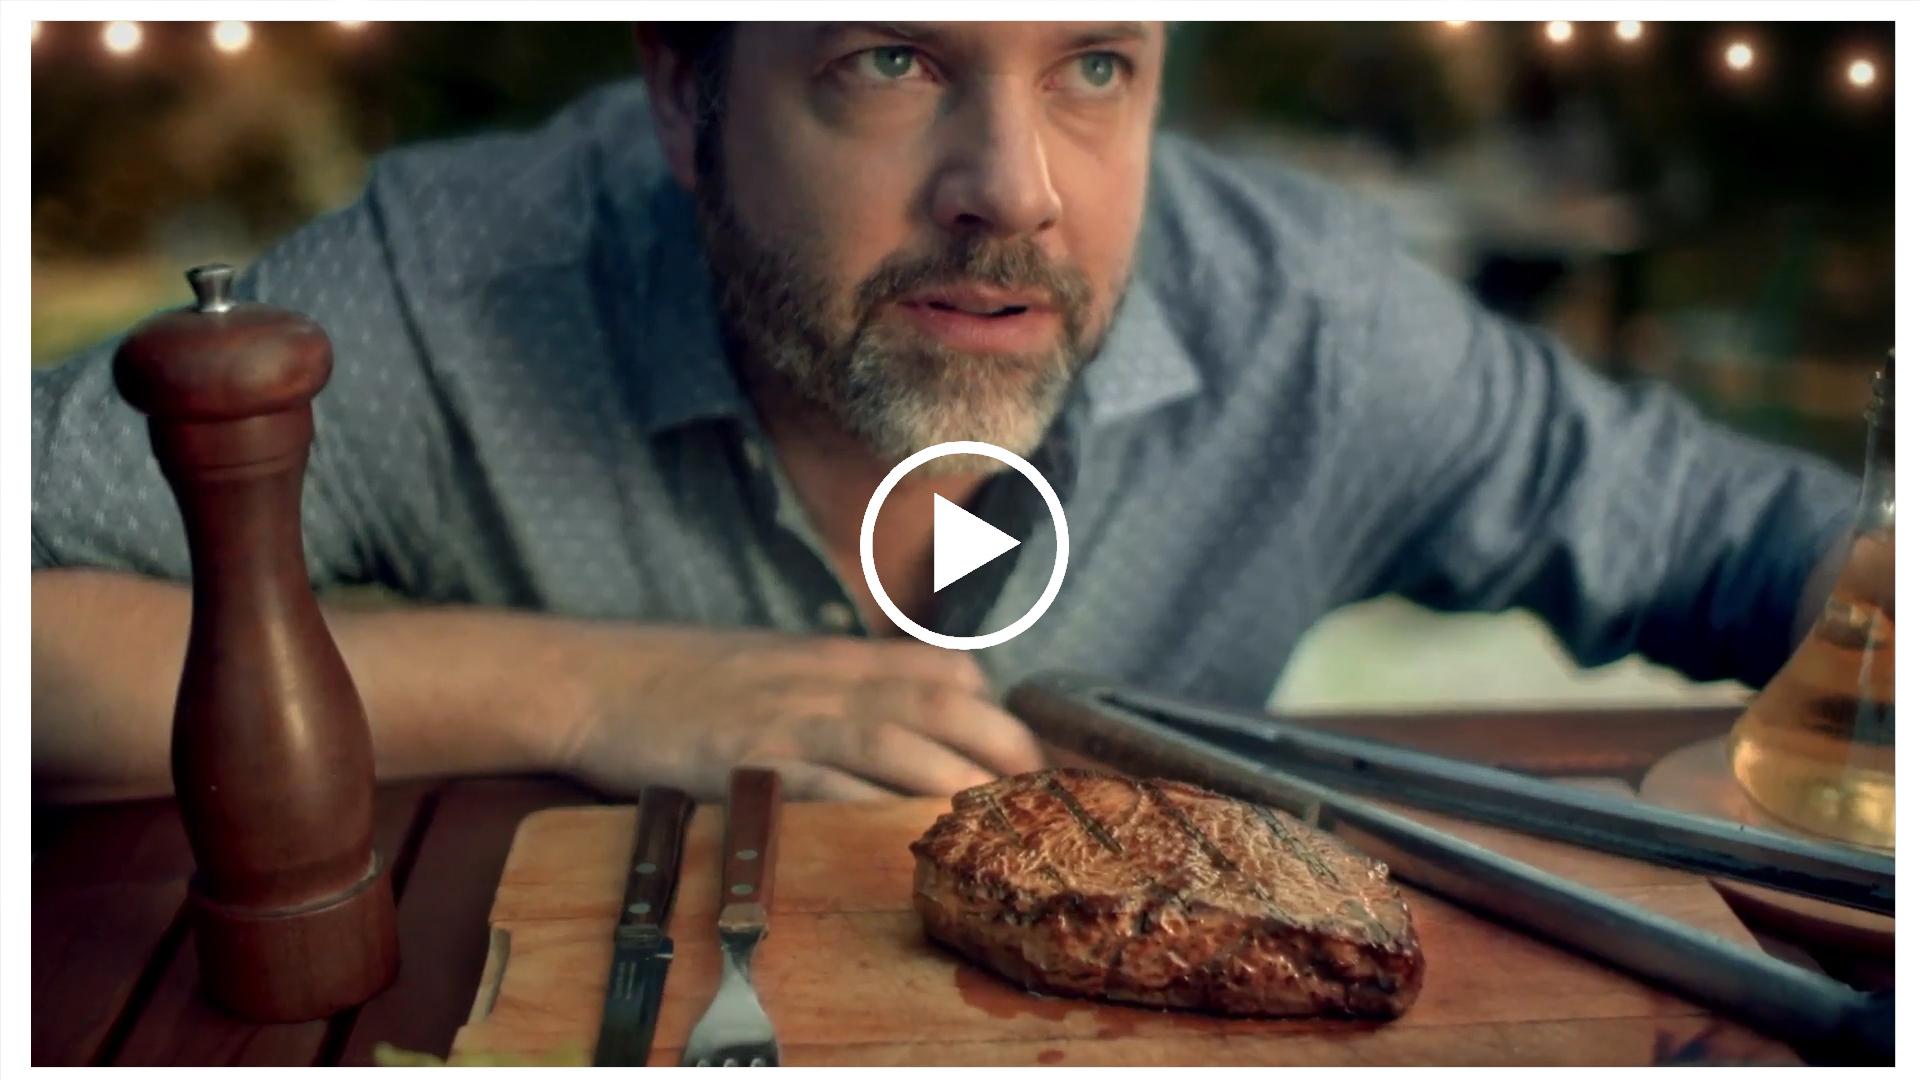 werbefilm-thomy-grillen-food